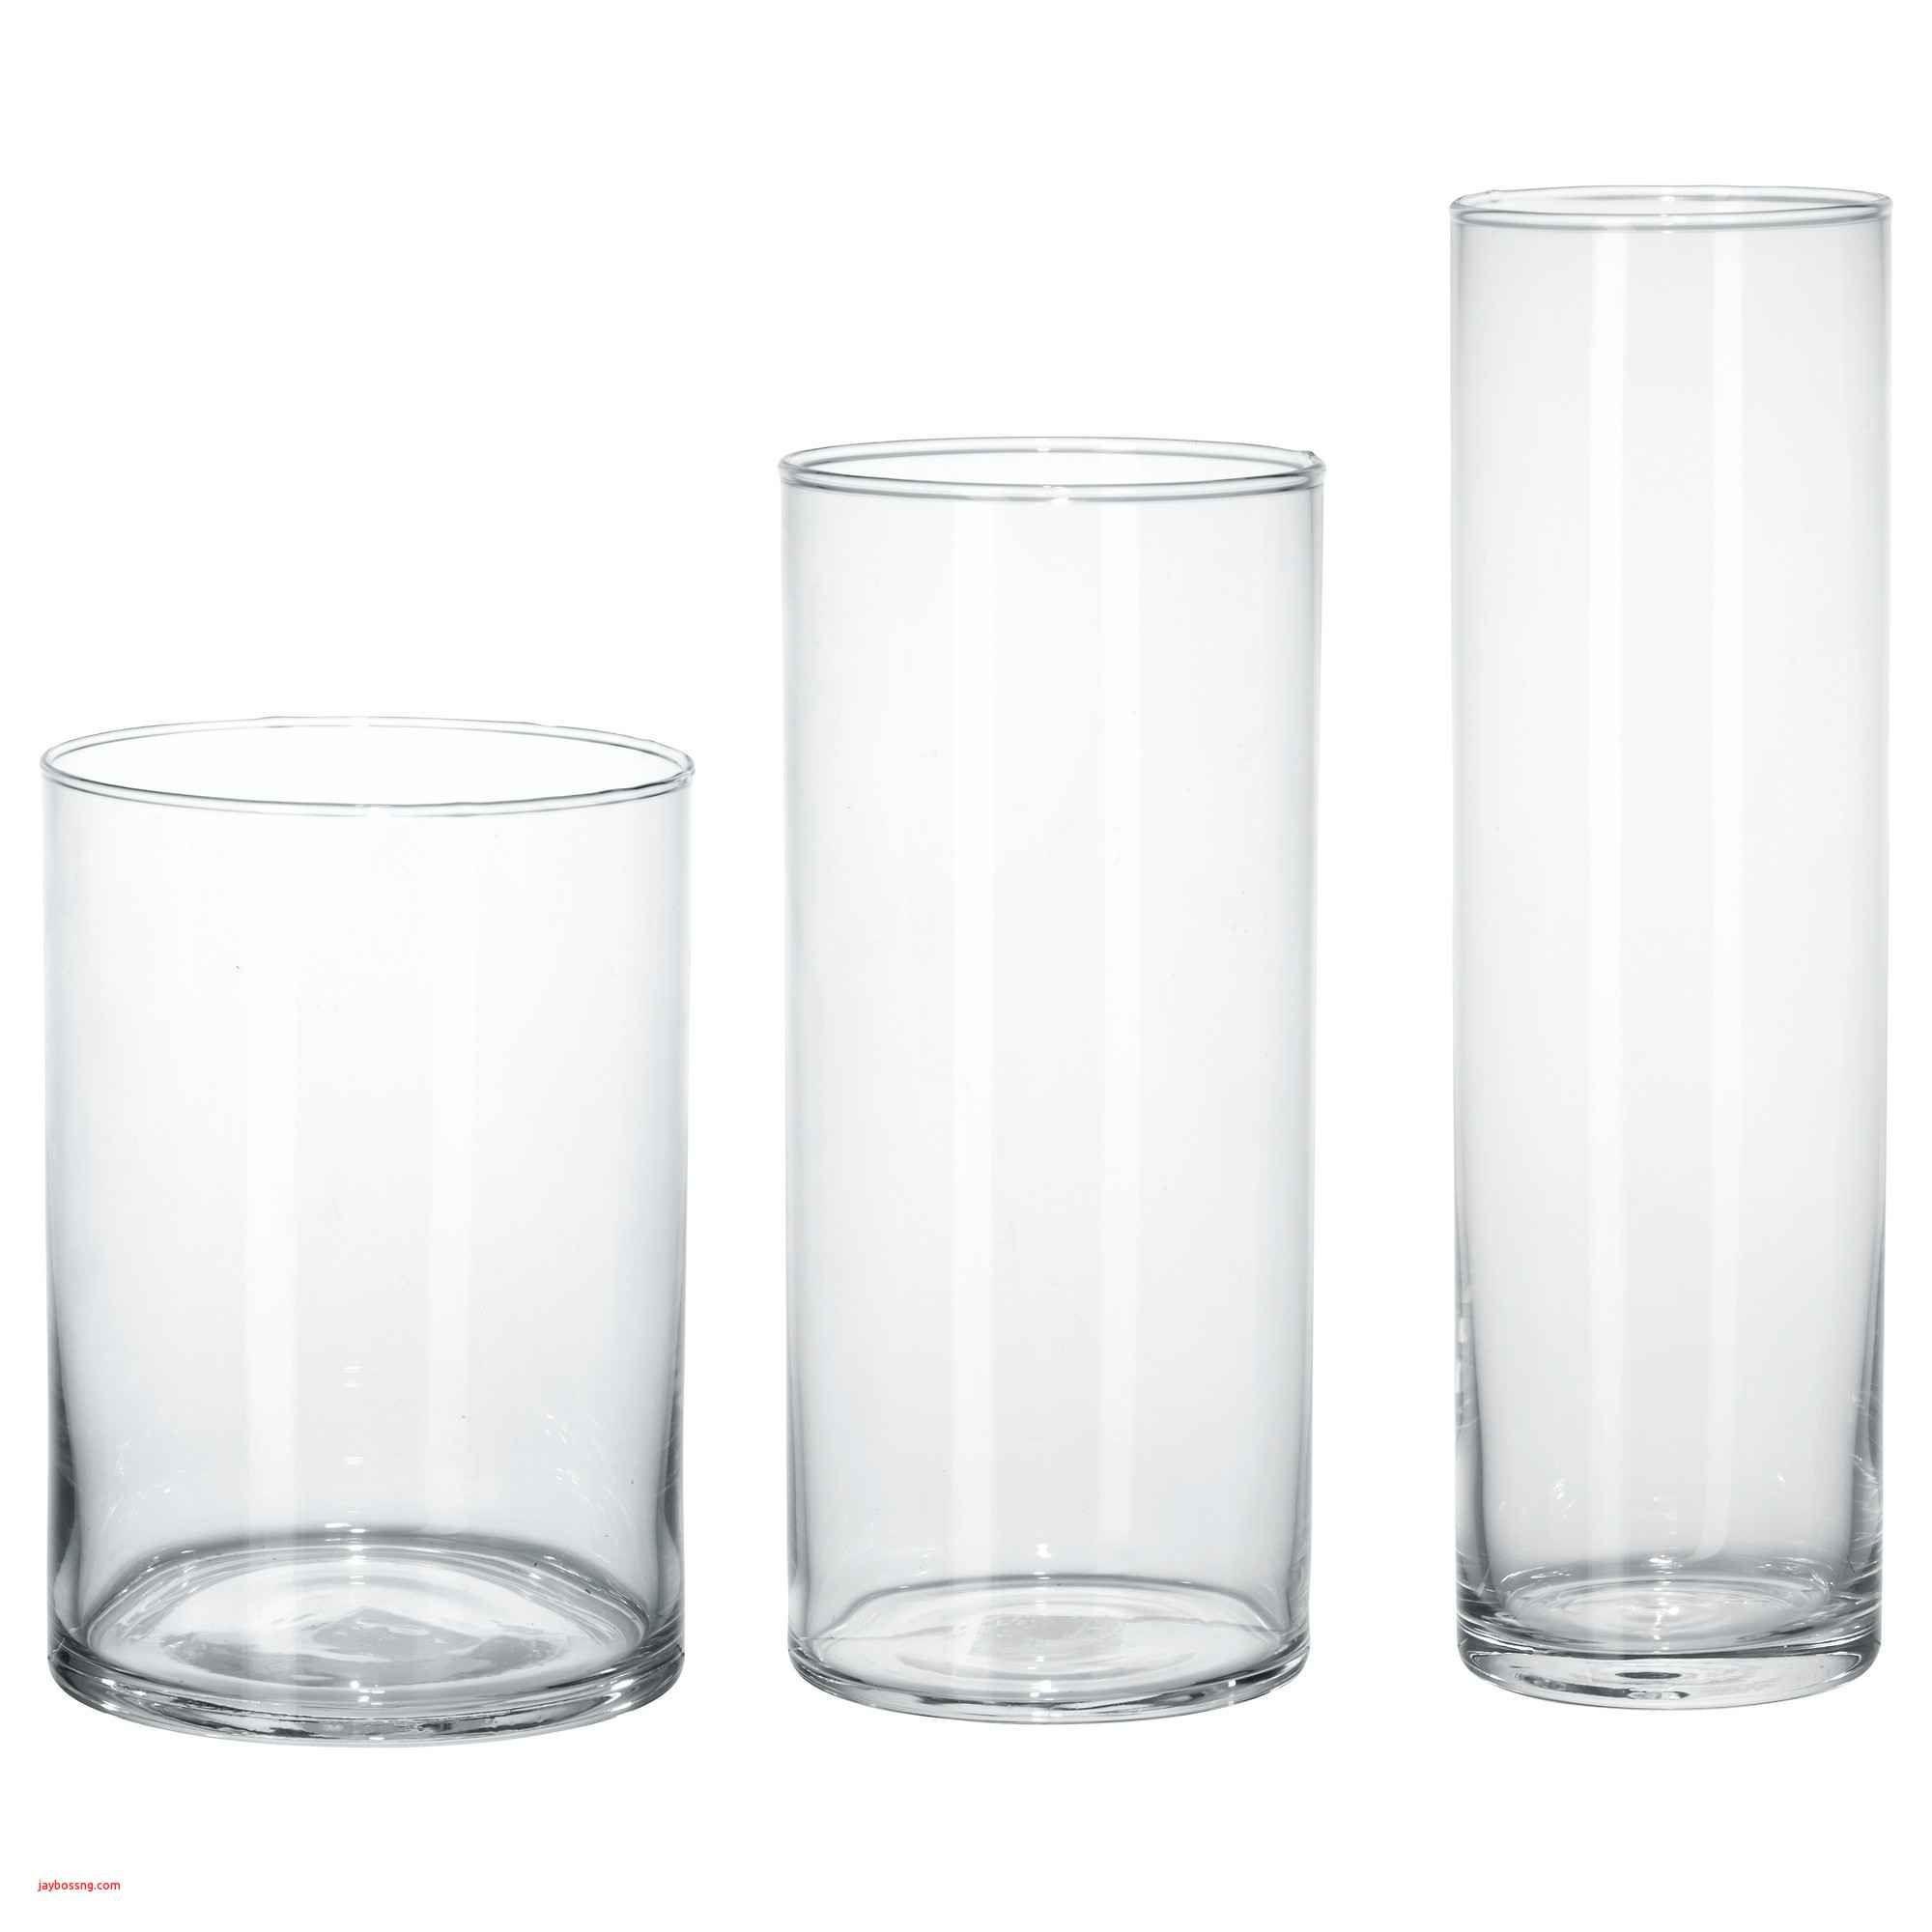 white plastic vase of brown glass vase fresh ikea white table created pe s5h vases ikea intended for brown glass vase fresh ikea white table created pe s5h vases ikea vase i 0d bladet